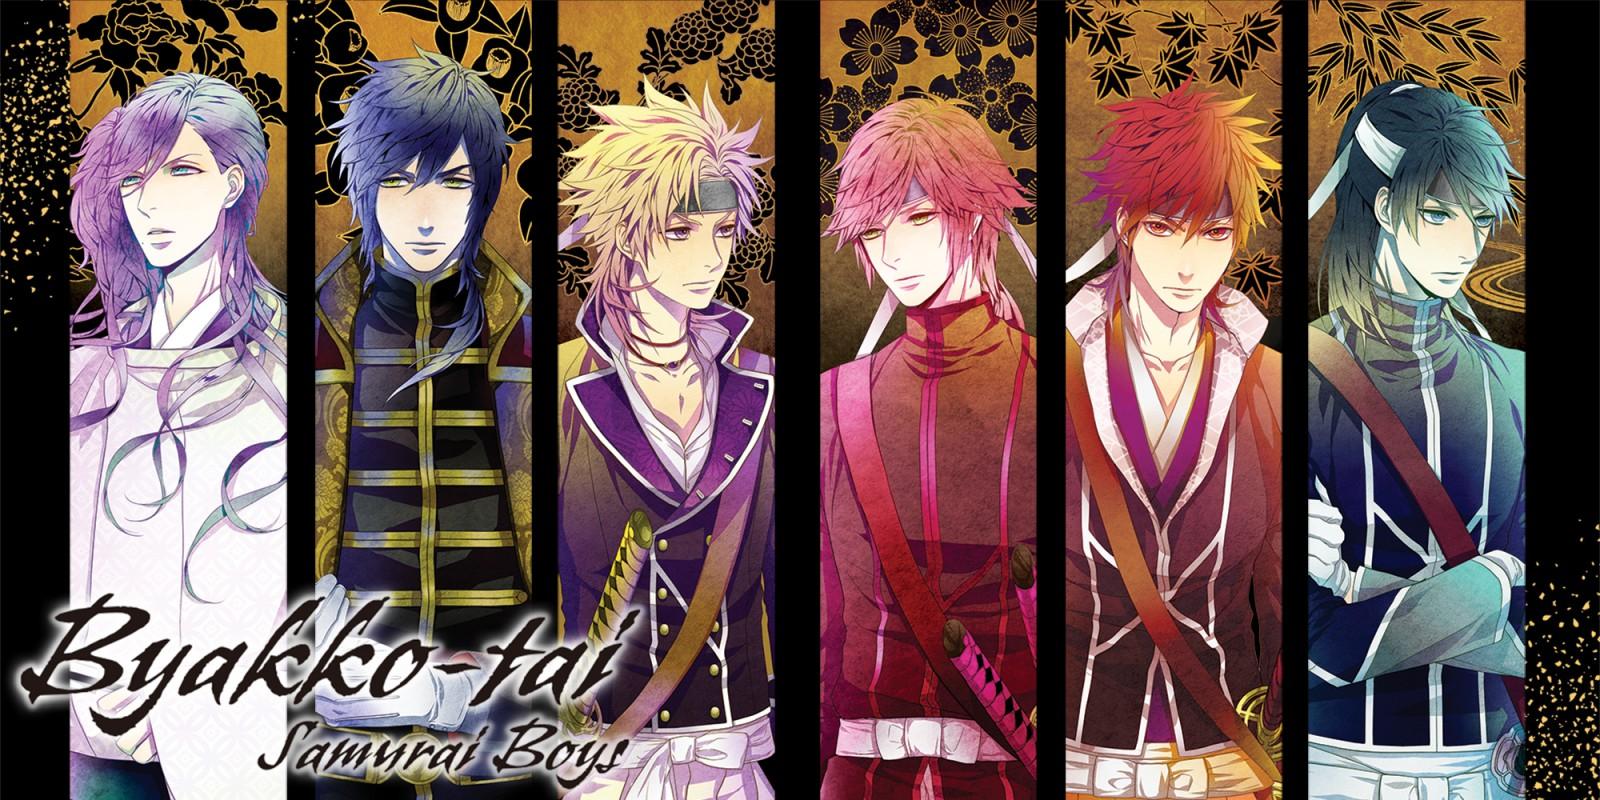 Byakko-tai Samurai Boys